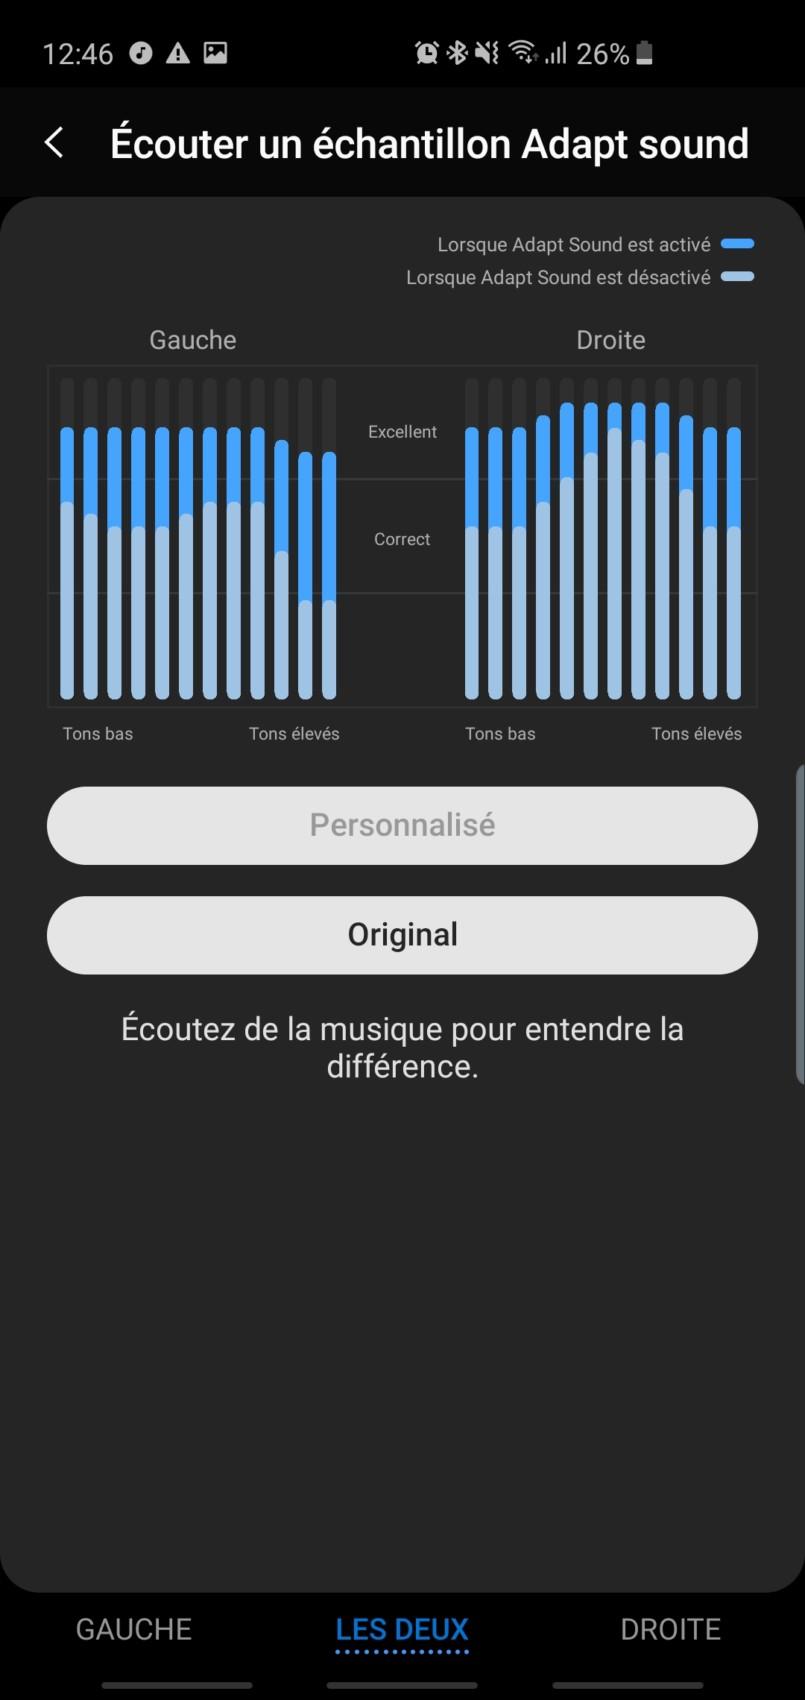 Screenshot_20190308-124631_Adapt sound